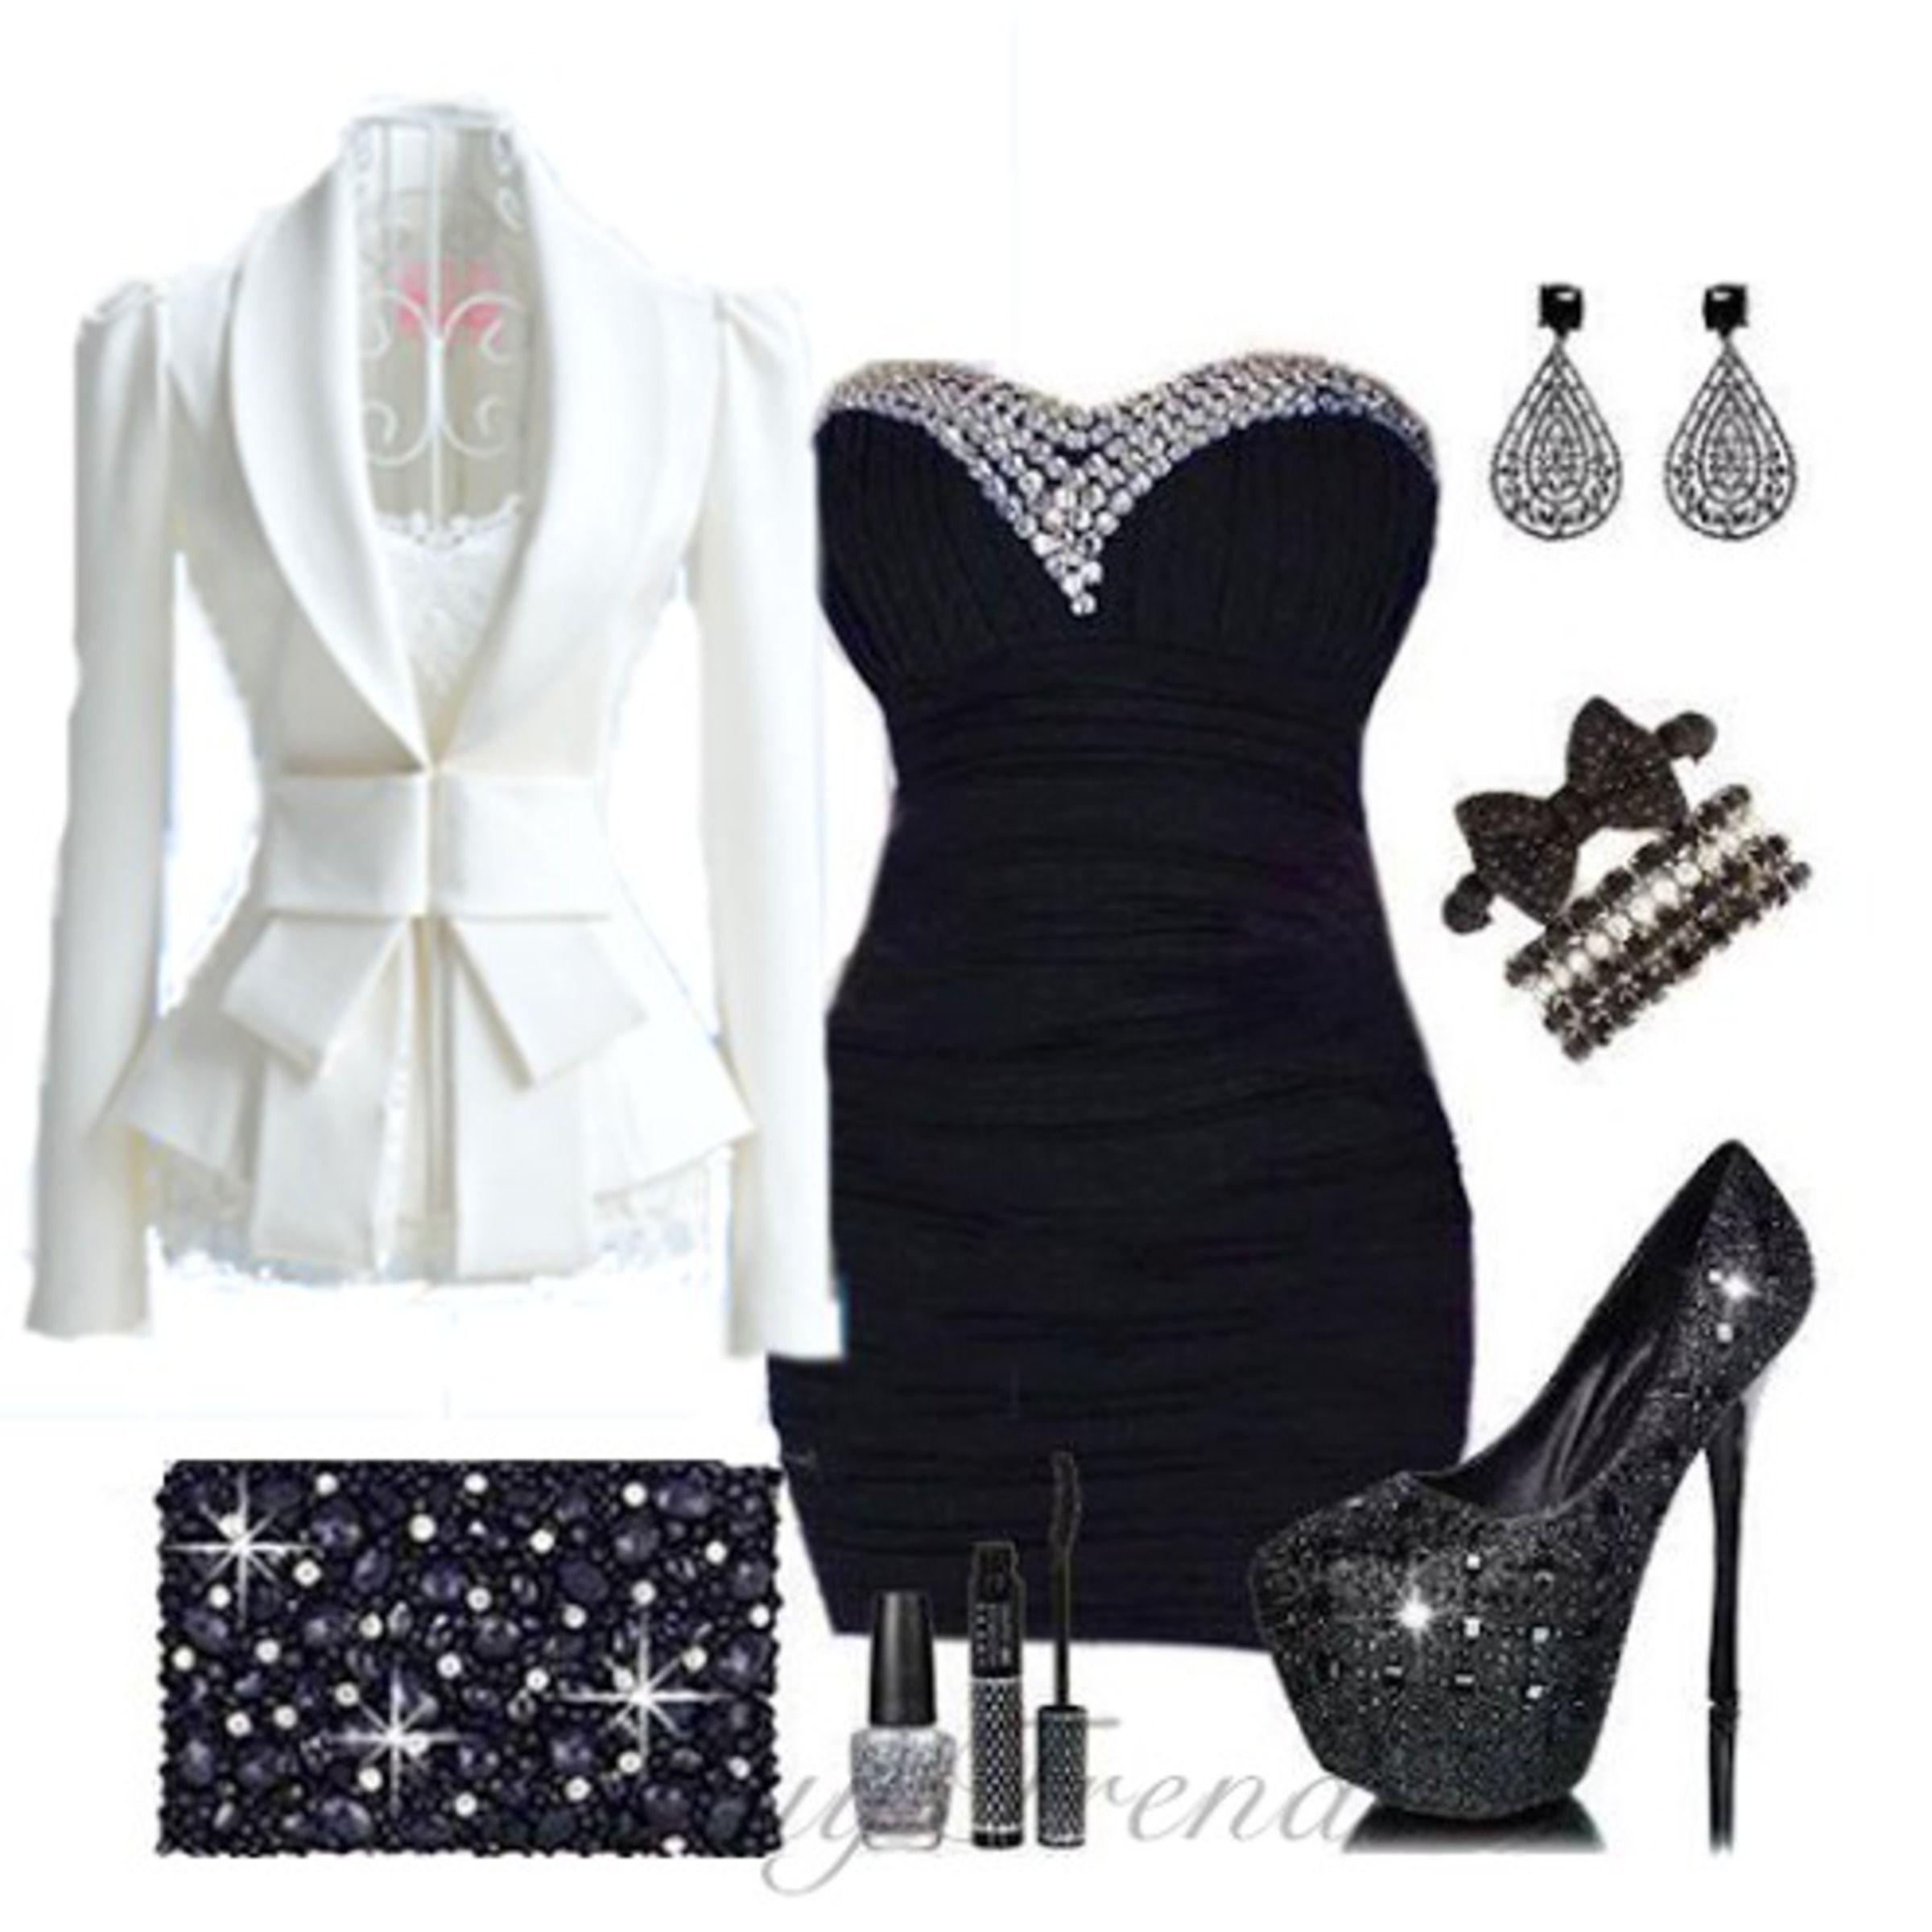 Vestido negro saco blanco